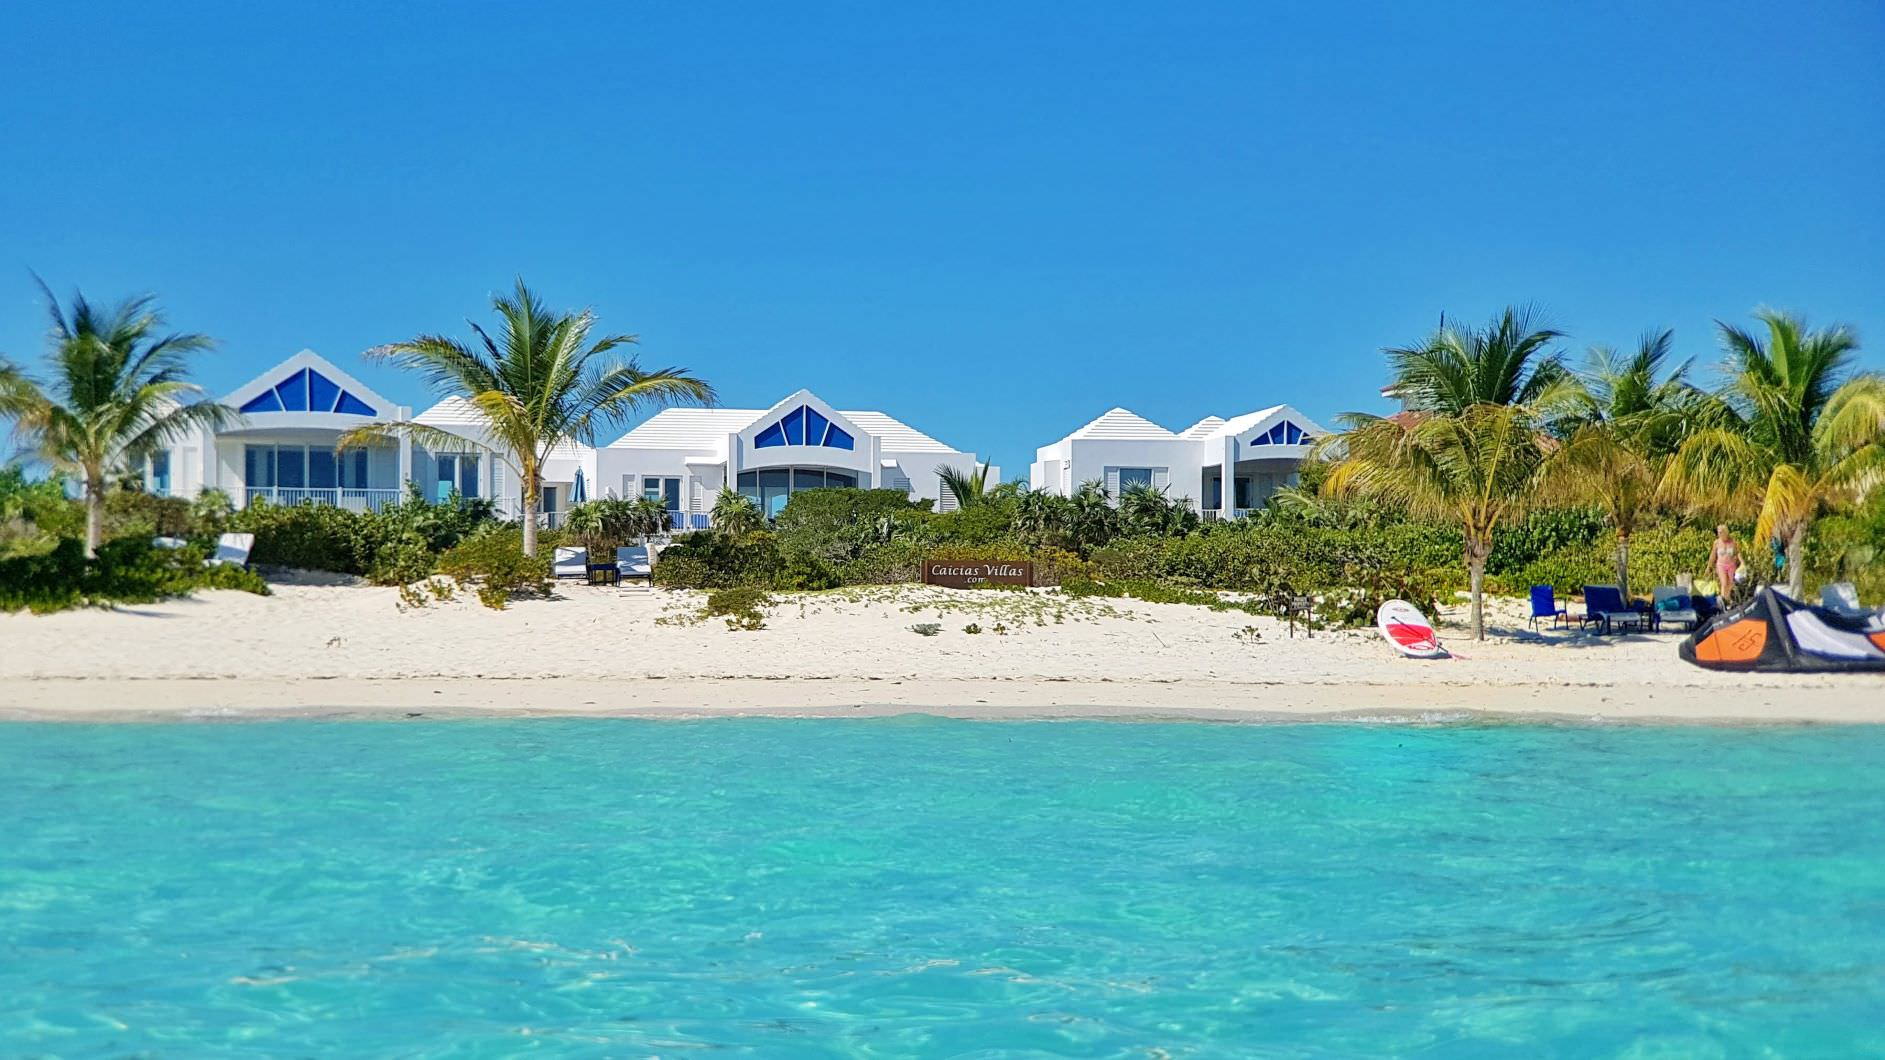 Caicias beachvillas Long Bay Turks and Caicos